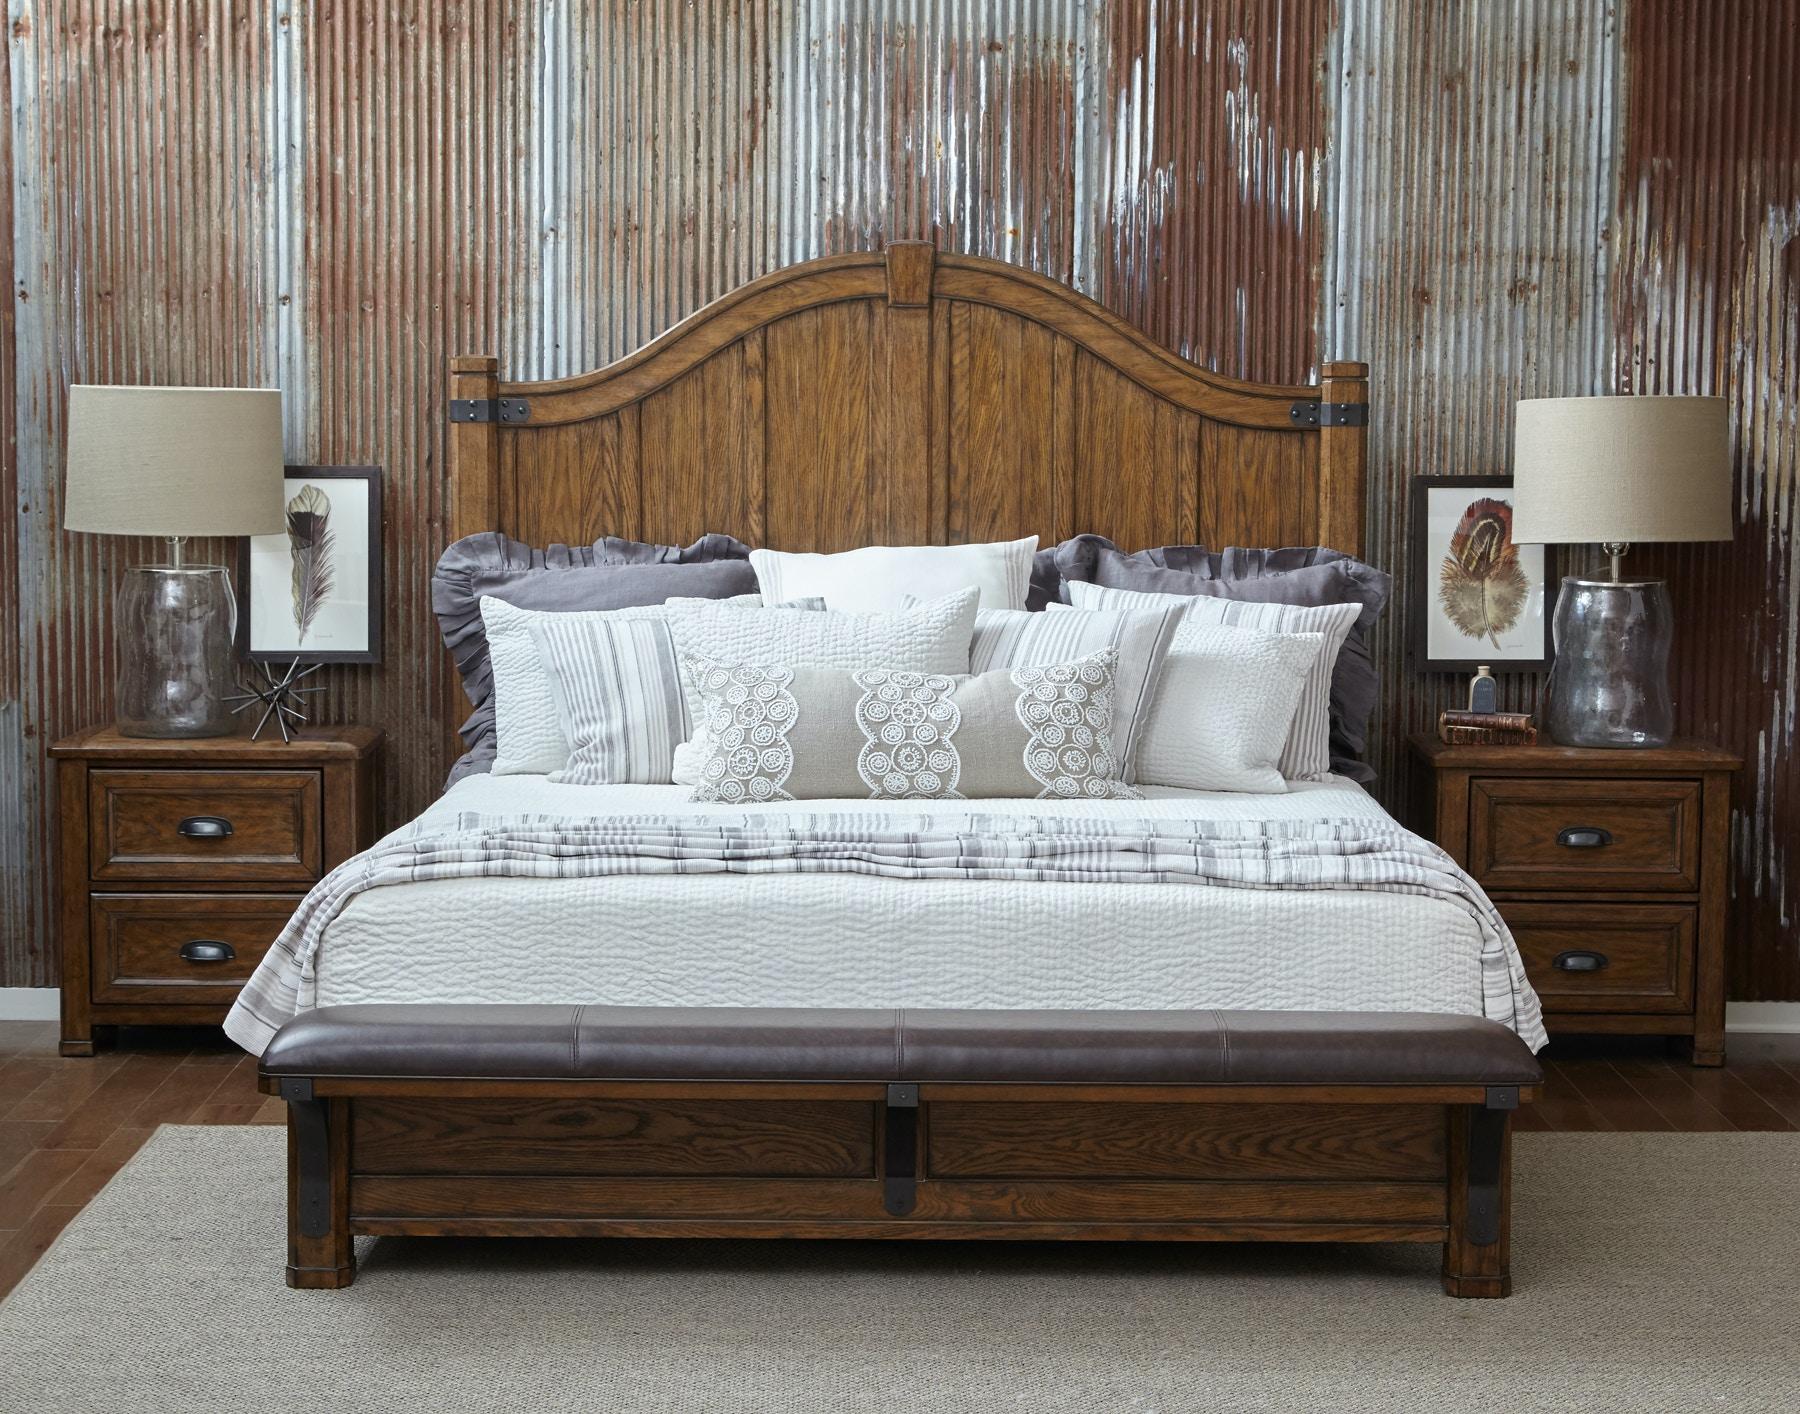 Pulaski Furniture Bedroom Heartland Falls Bed Queen 554594 Furniture Fair Cincinnati